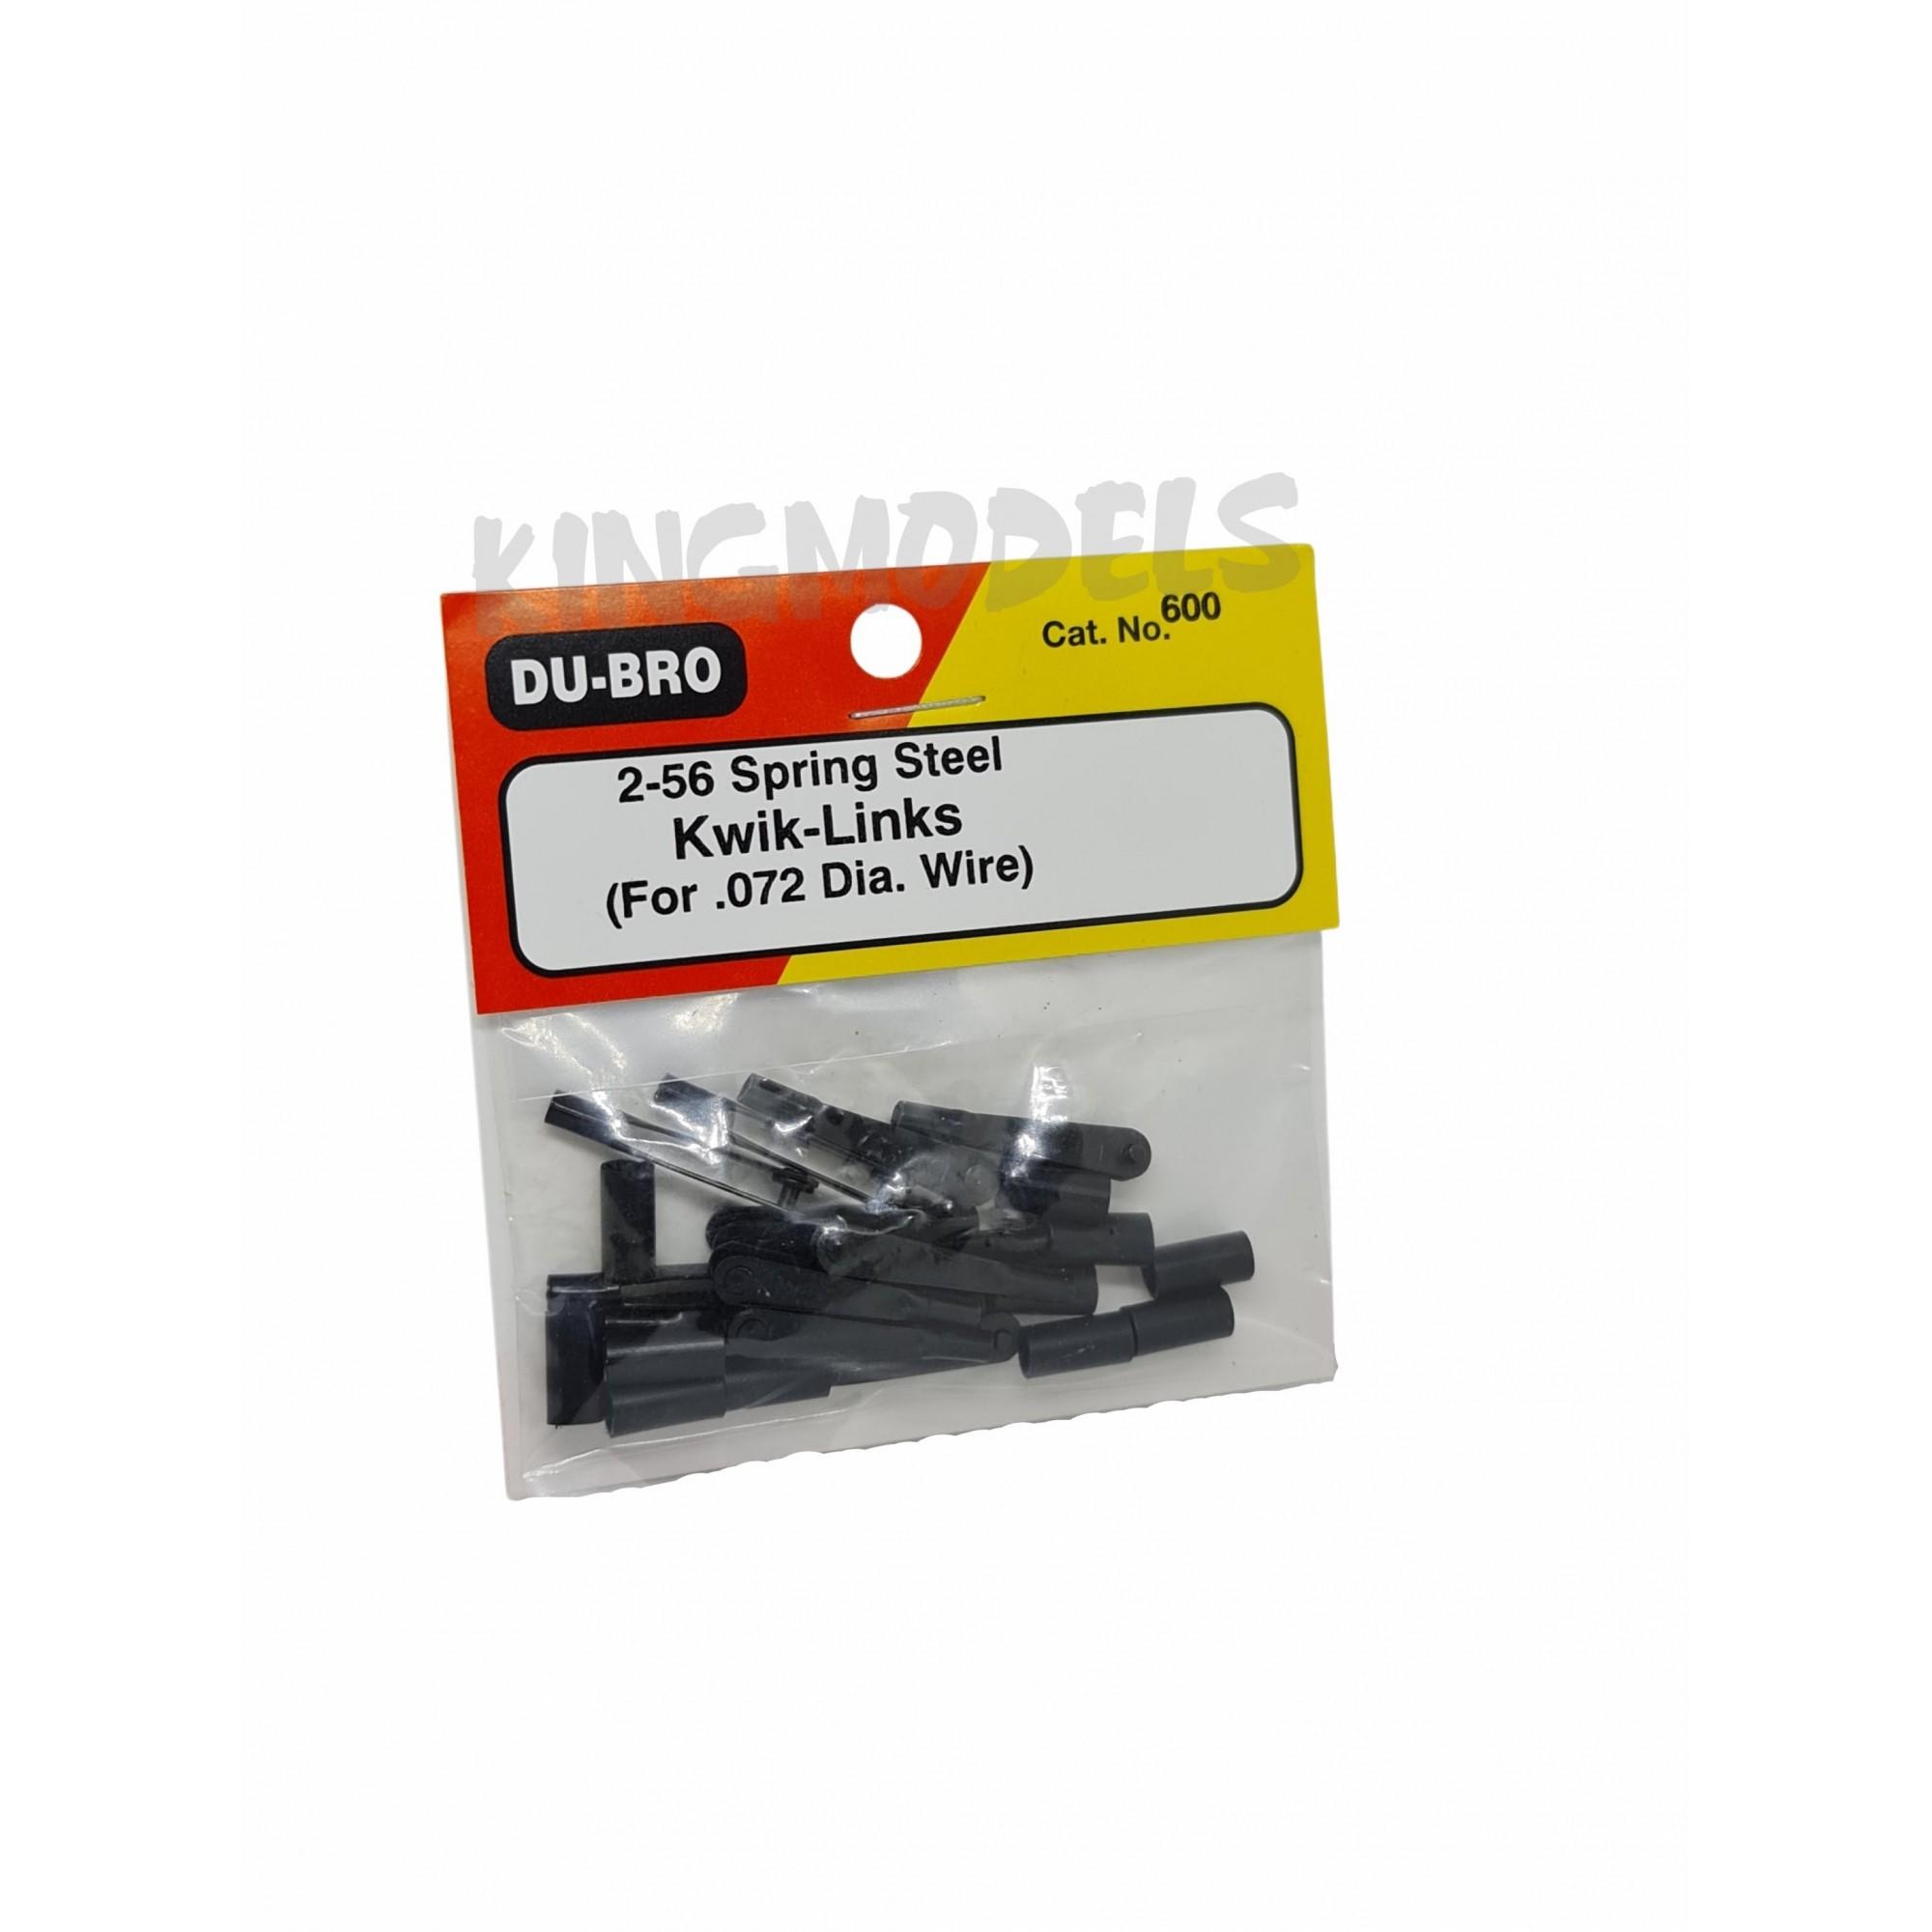 12pçs Push Rod / Clevis Dubro - Metal 2-56 C/ Rosca Dub600  - King Models